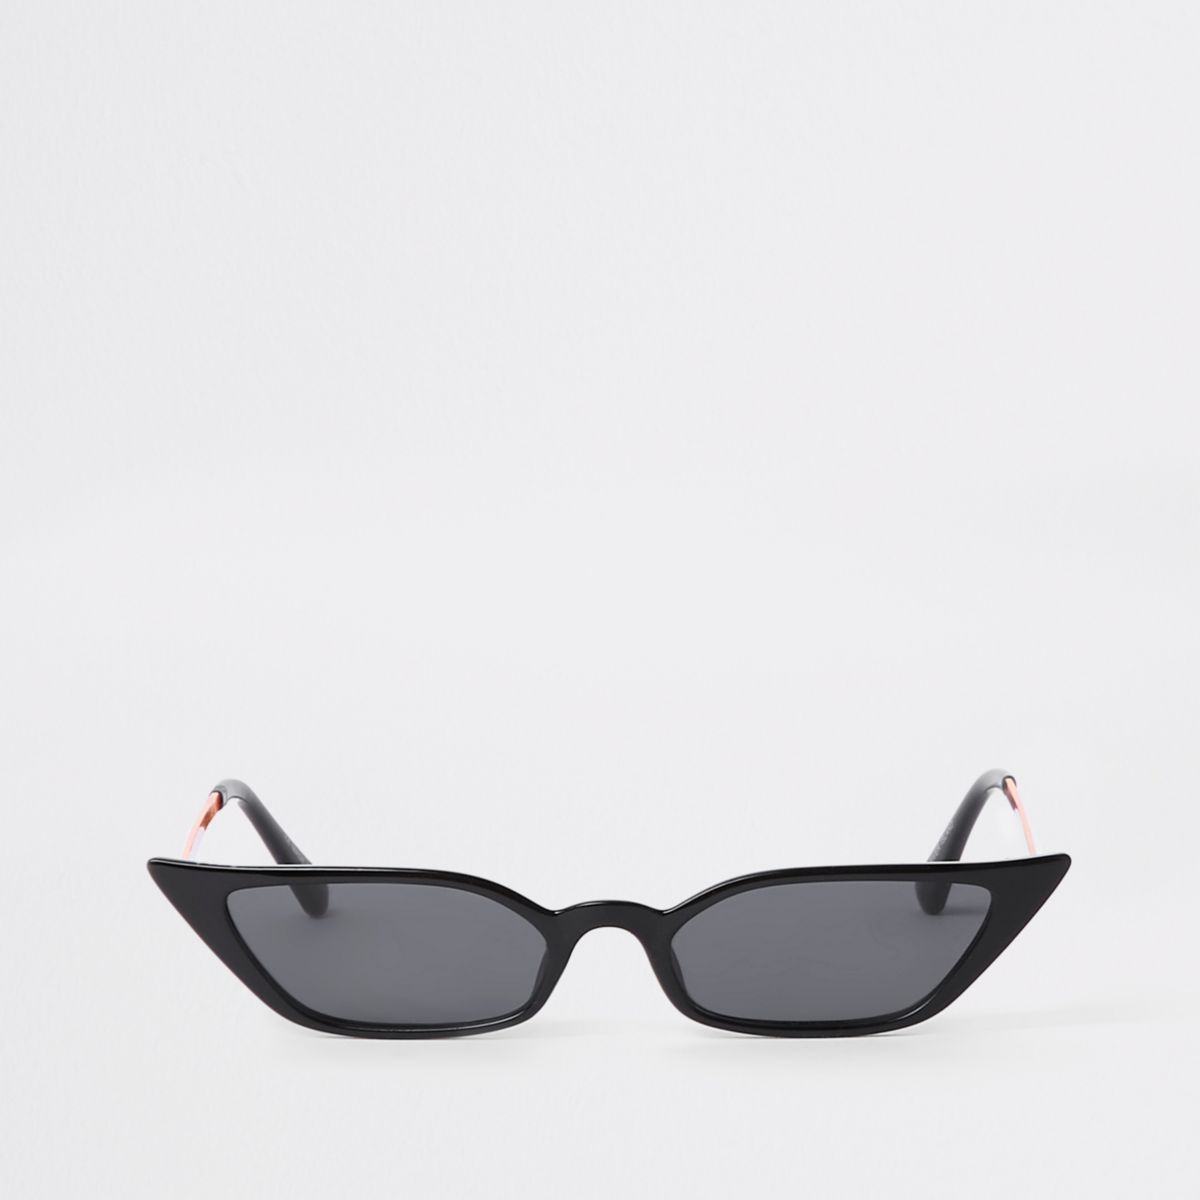 Black super slim frame pointed sunglasses